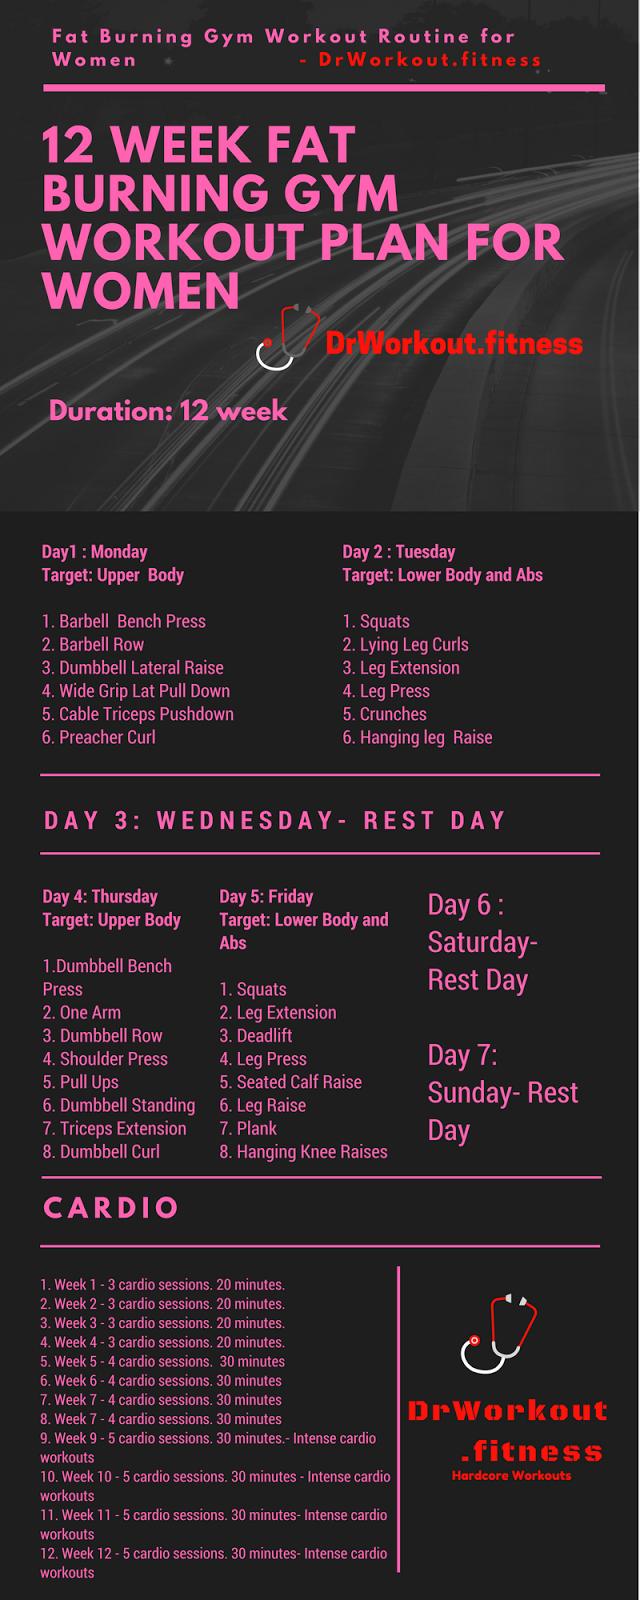 Fat Loss Gym Workout Plan For Women Health Pinterest Workout